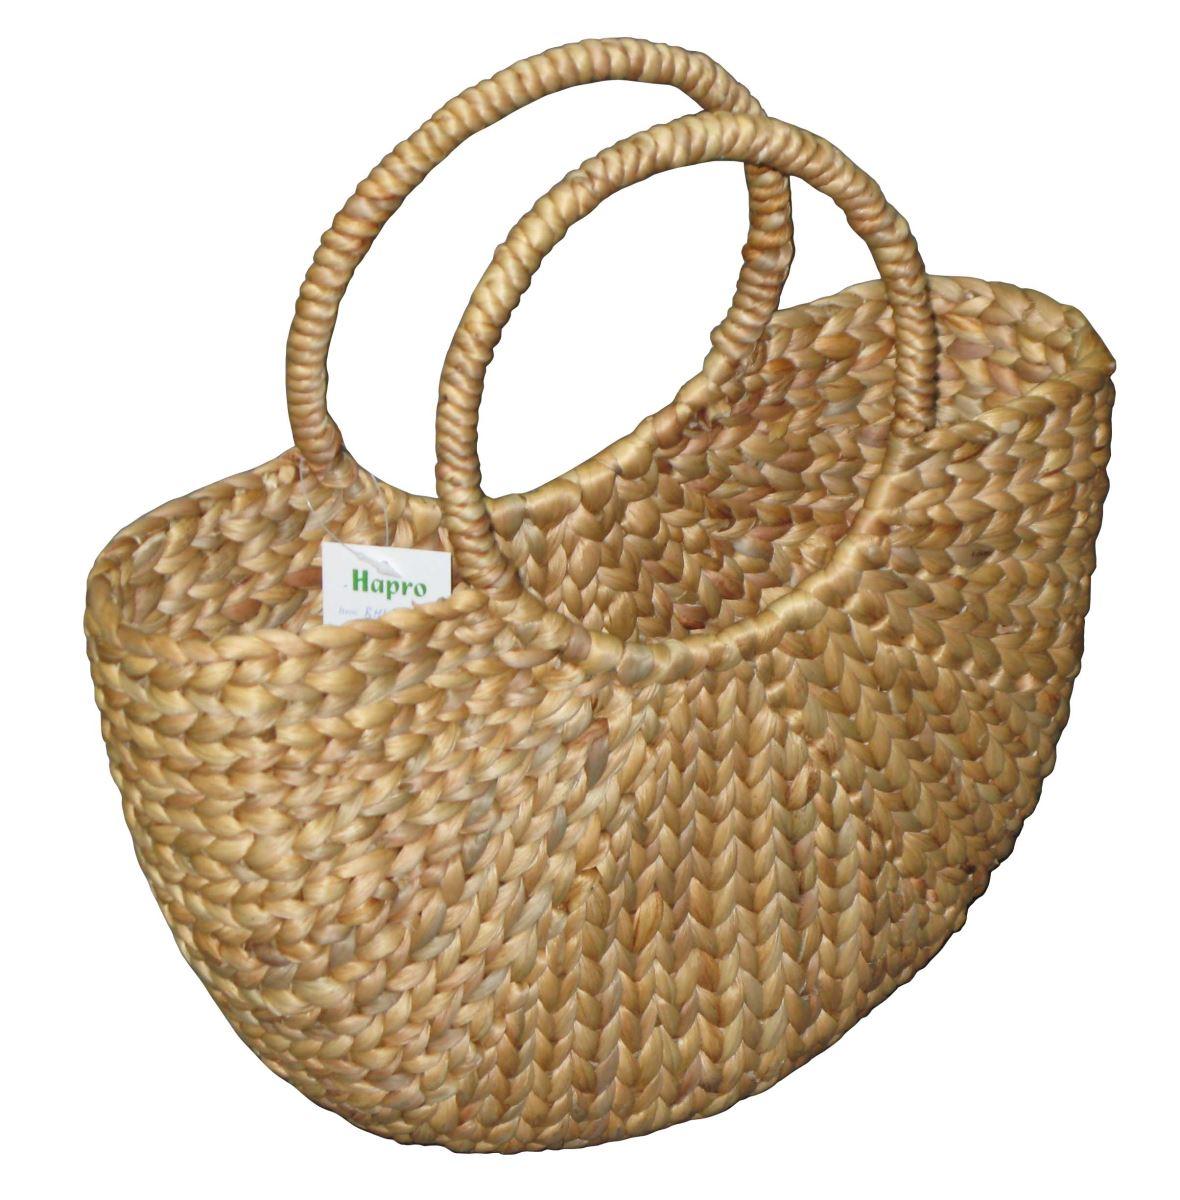 Waterhyacinth bag